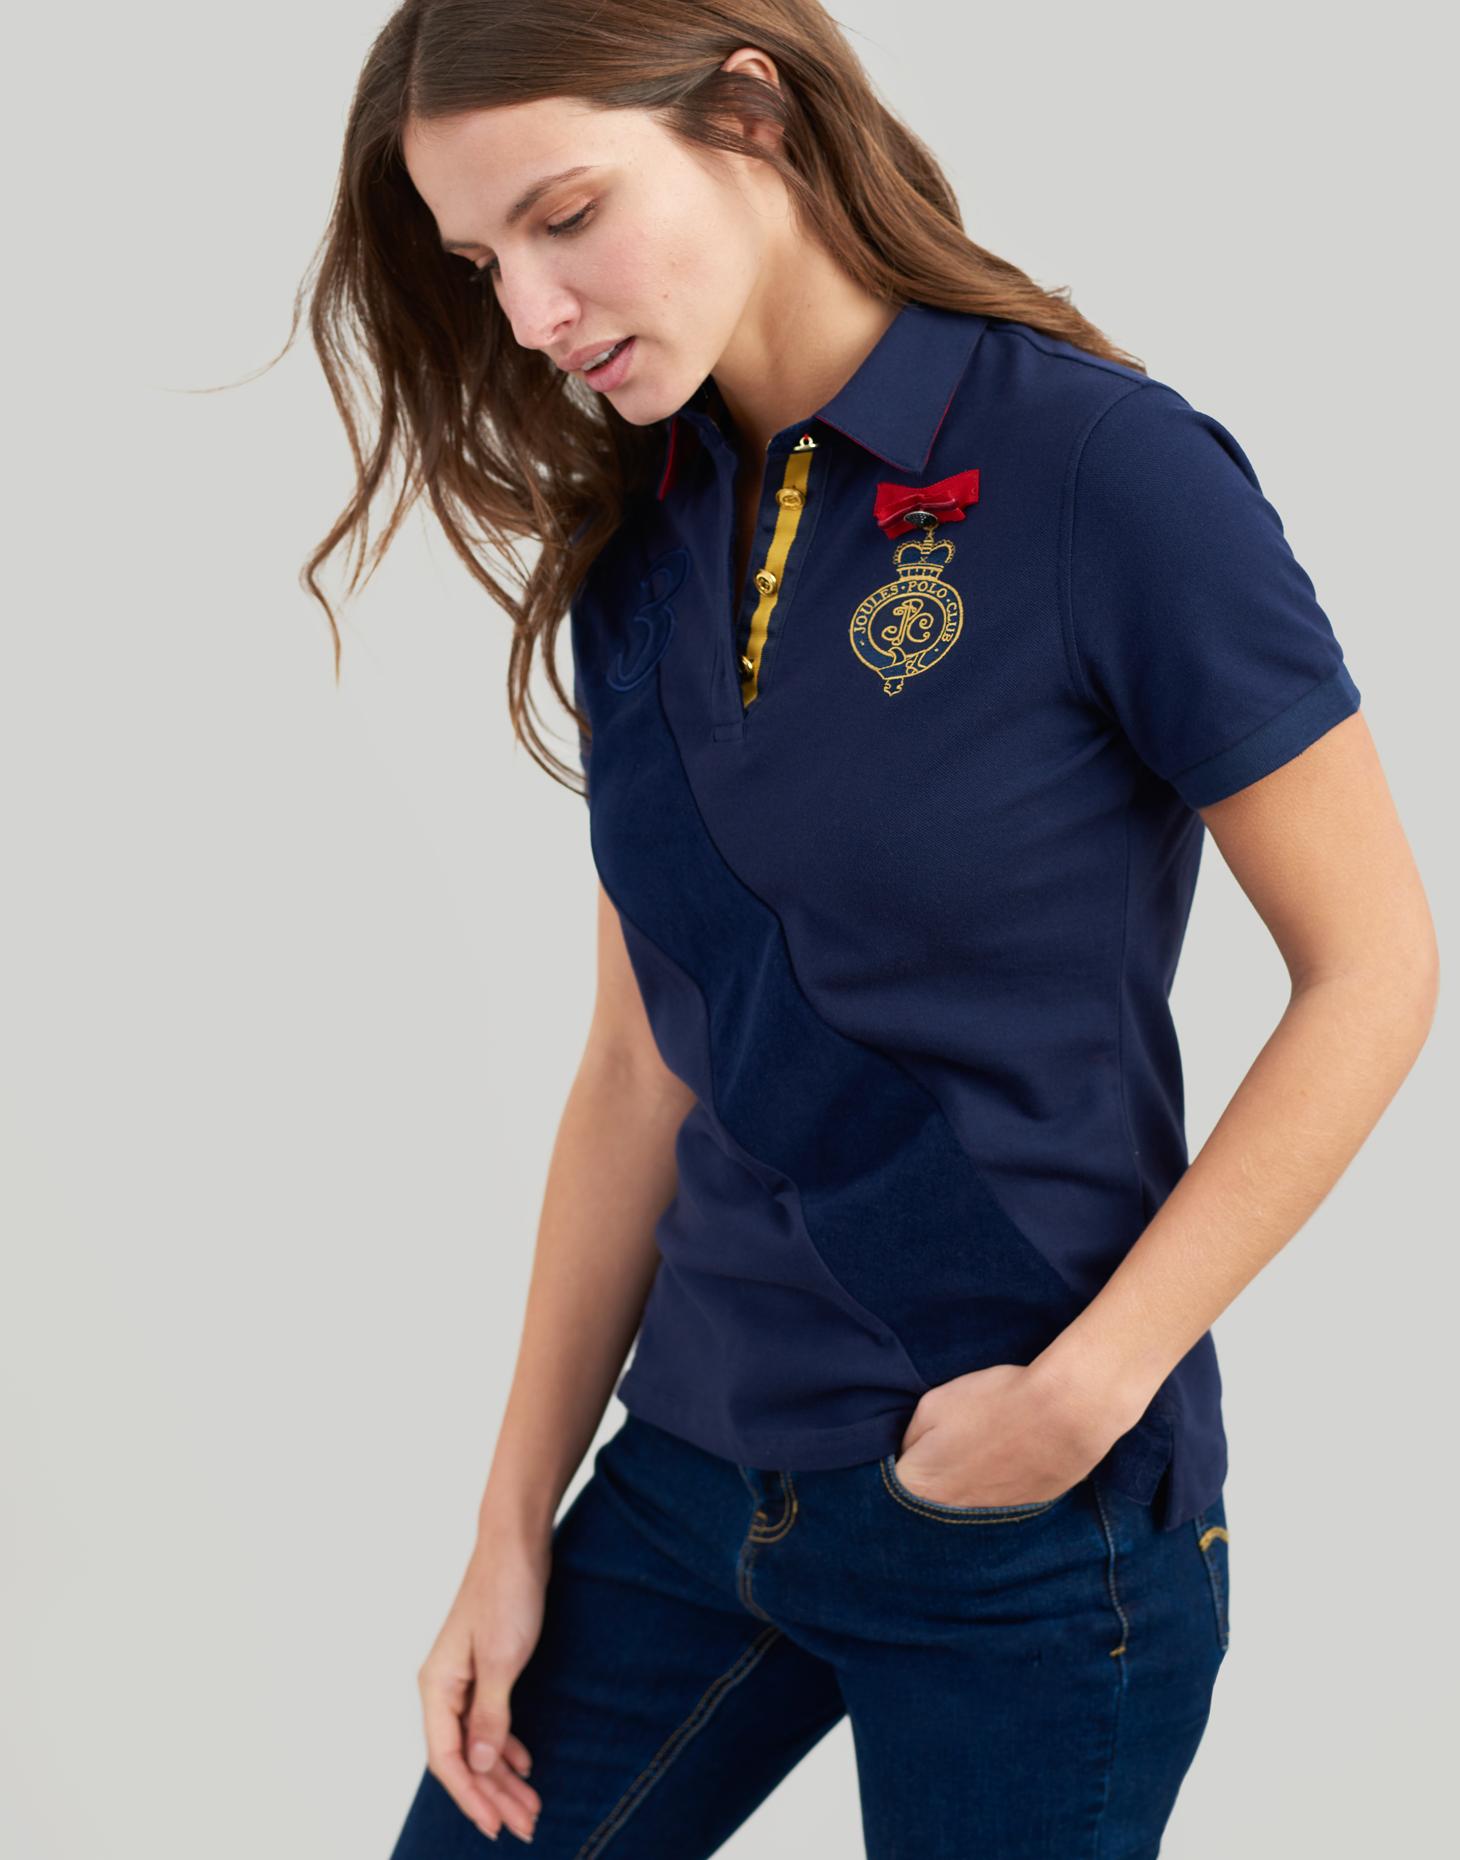 Joules ClaROTon Damenschuhe Polo Shirt - Navy French Navy - 2cf777